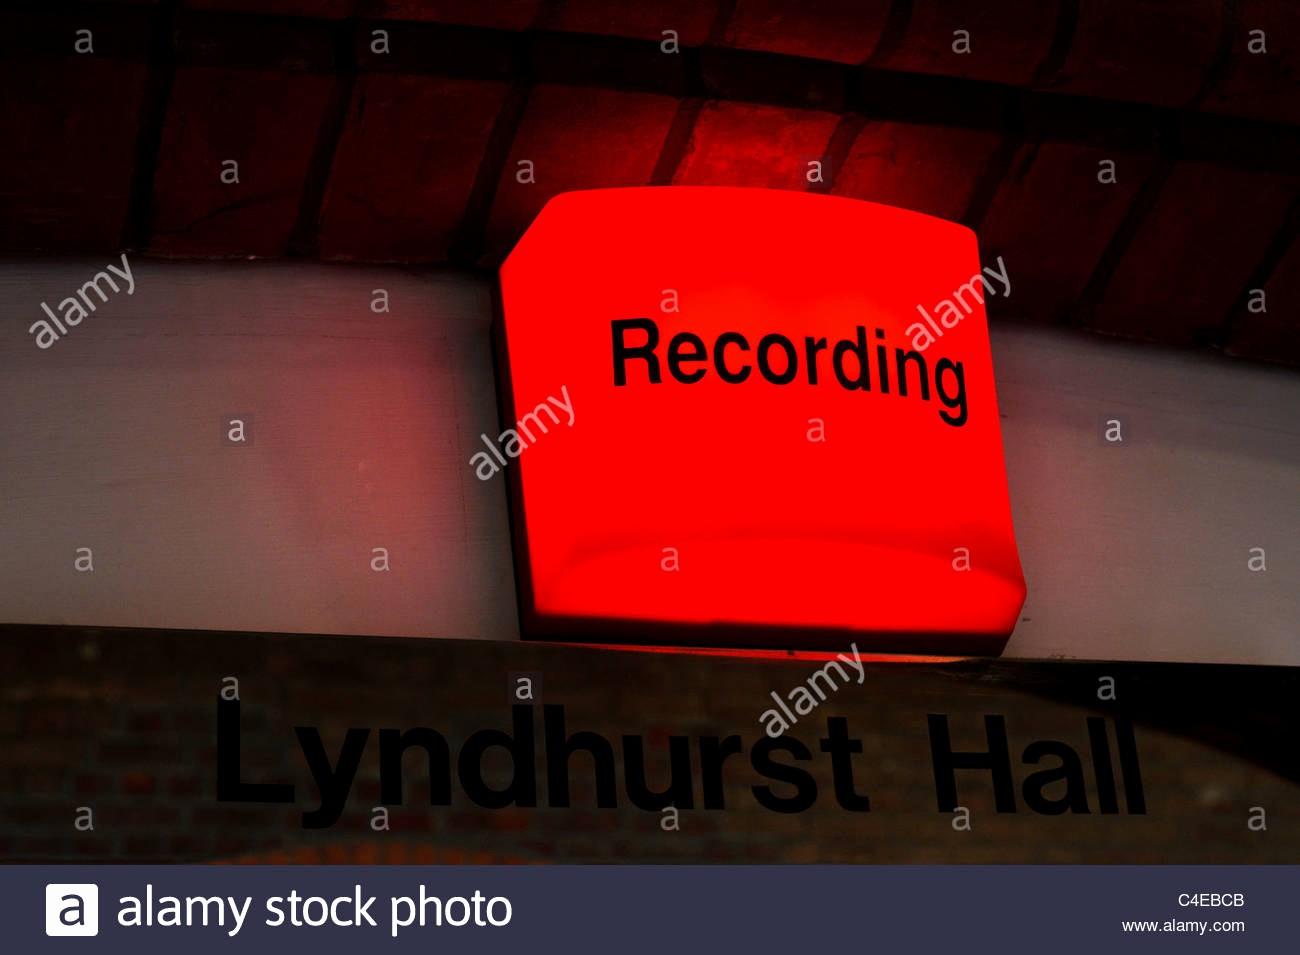 "Recording In Progress Door Sign Unique A ""recording In Progress"" Red Light Lit About the Door"